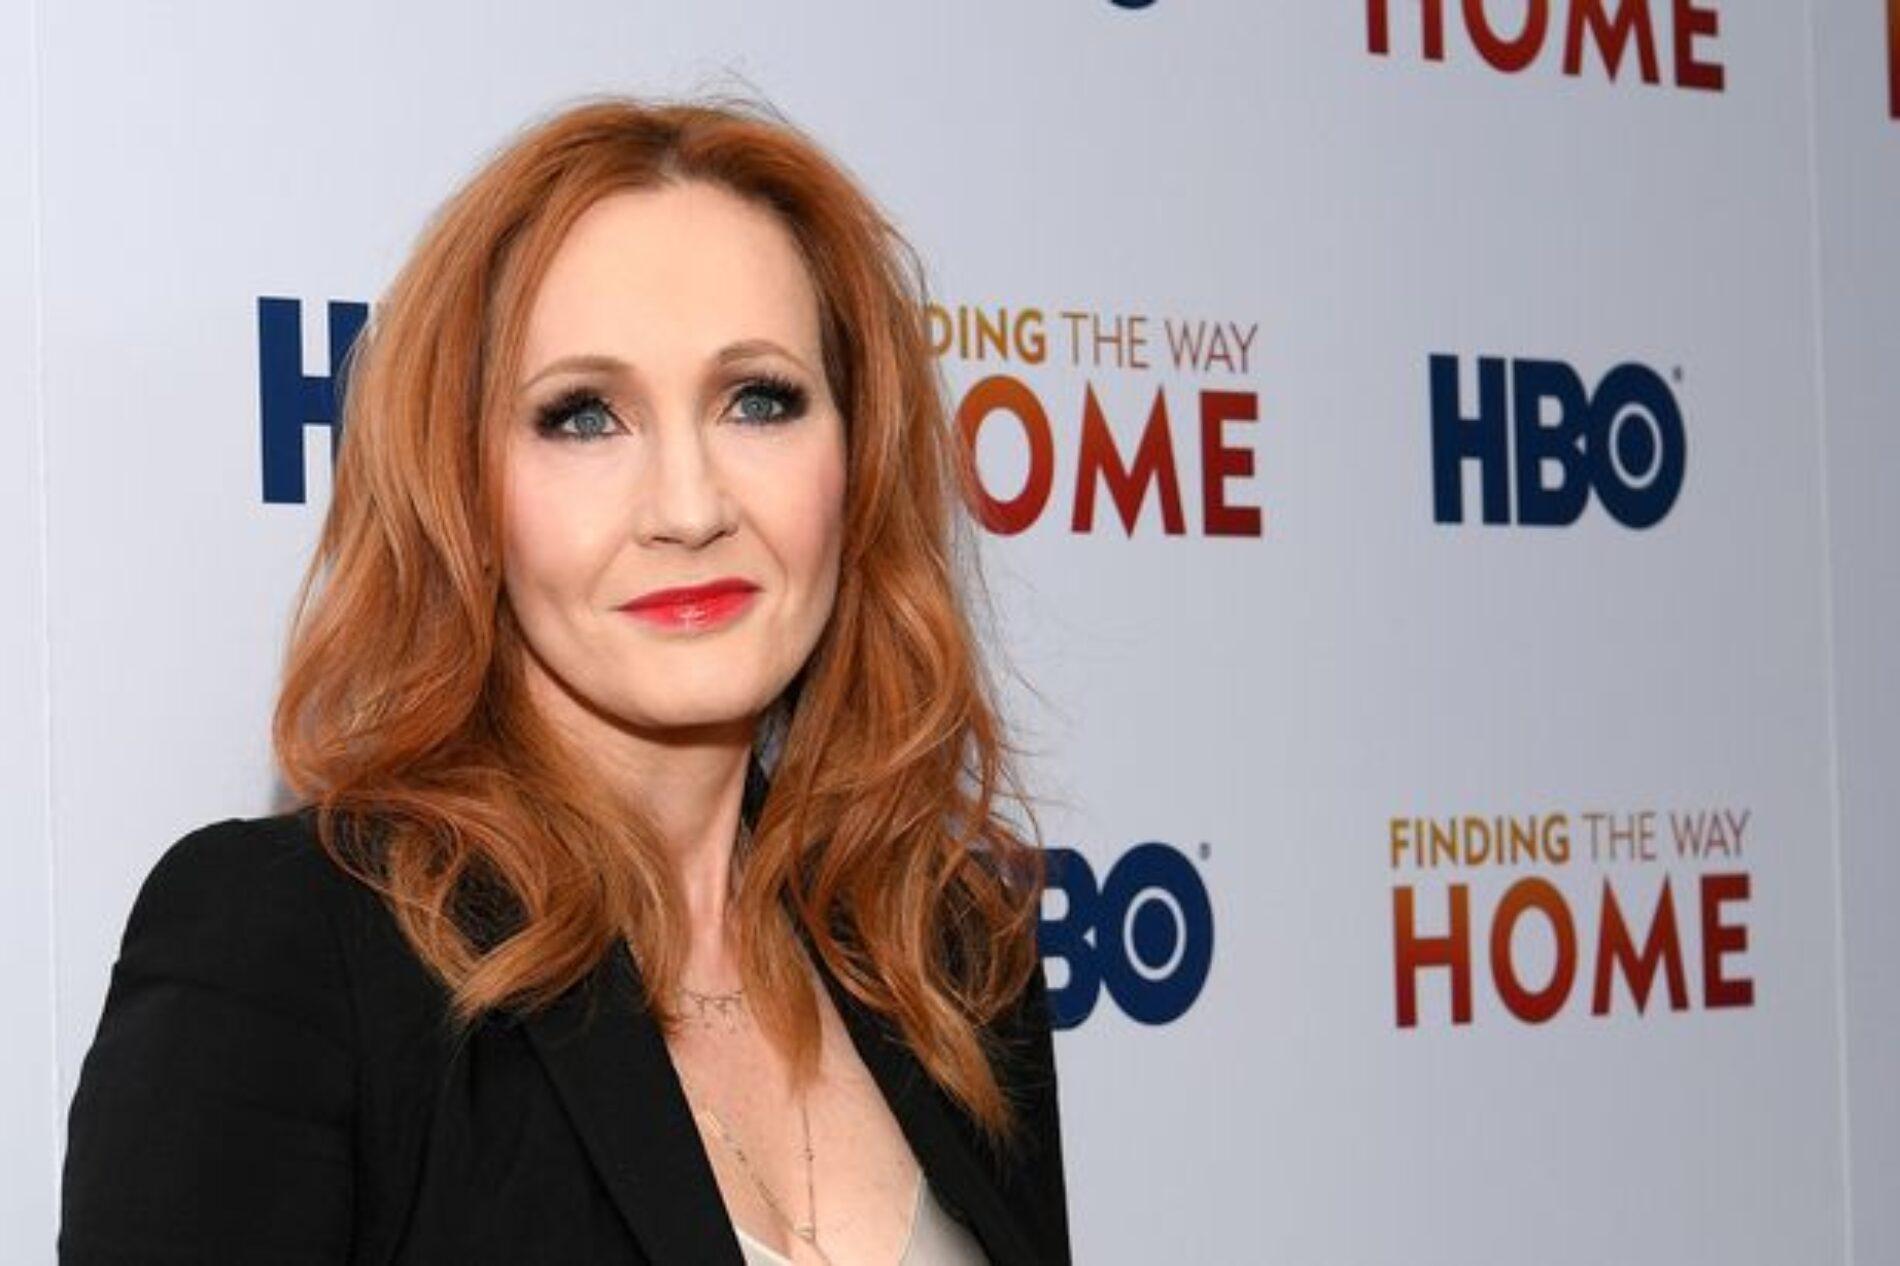 JK Rowling faces backlash over tweets considered transphobic